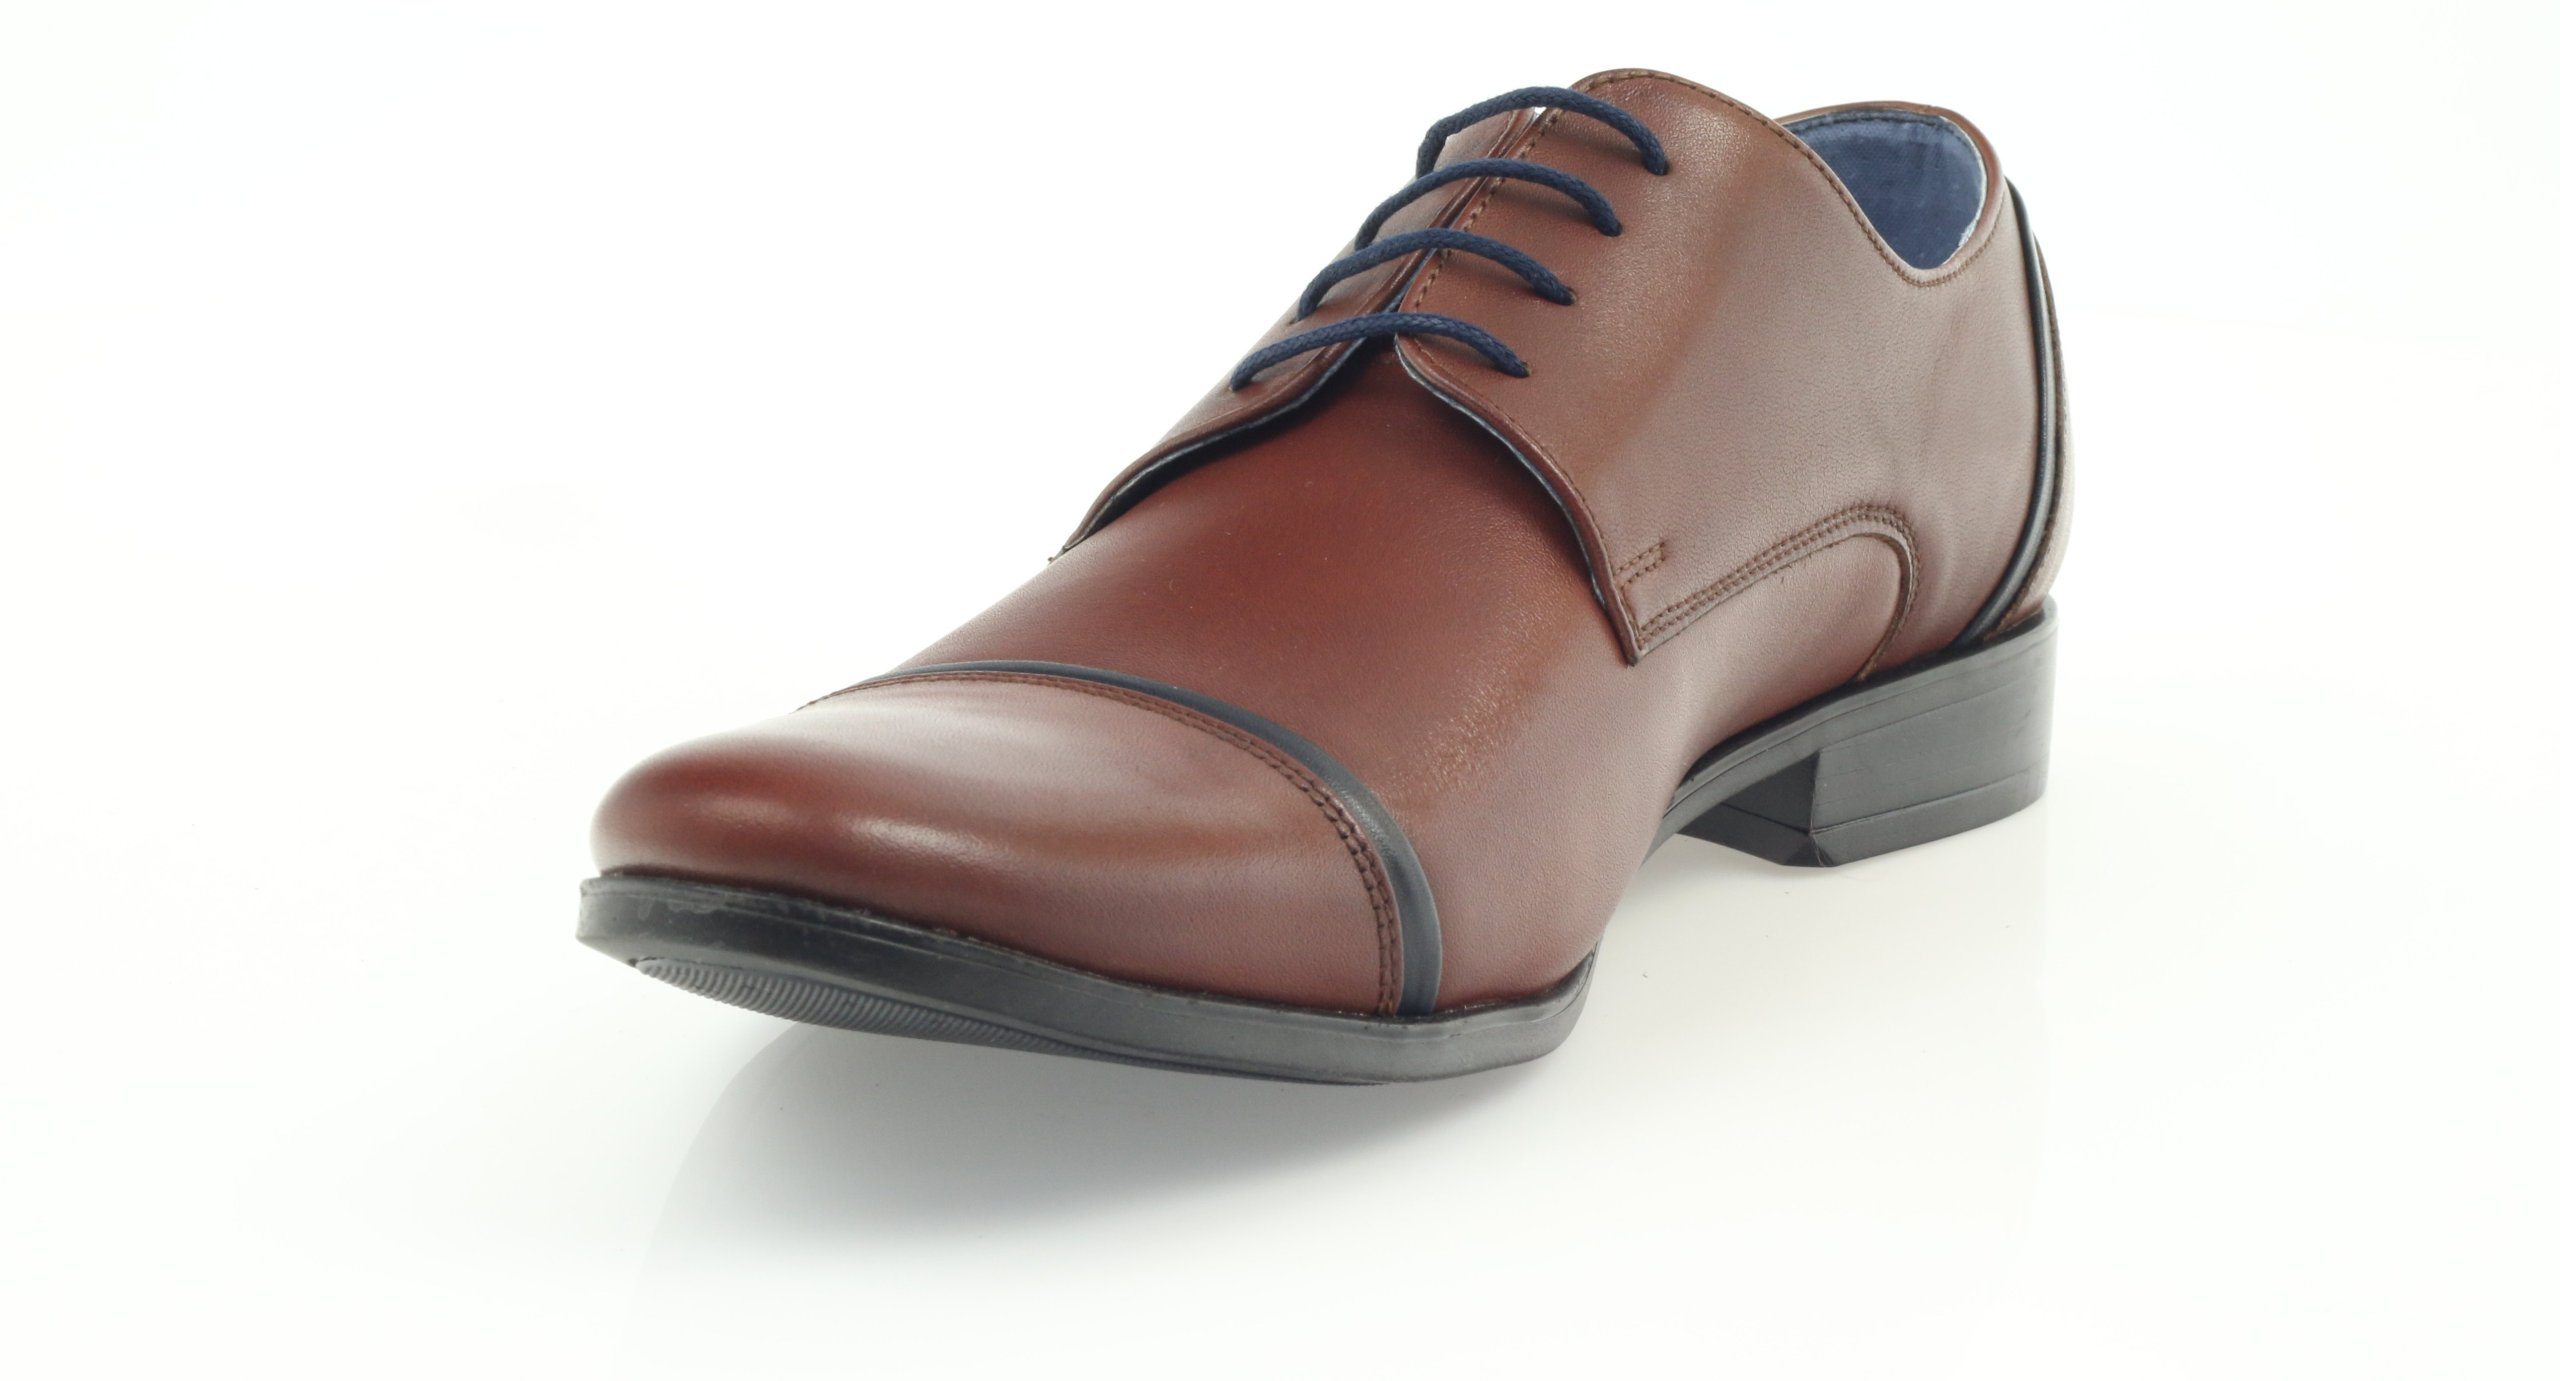 80f06e3eb3f9f Pantofle męskie VENI VICI 149 brązowe r.40 - 7391892142 - oficjalne ...